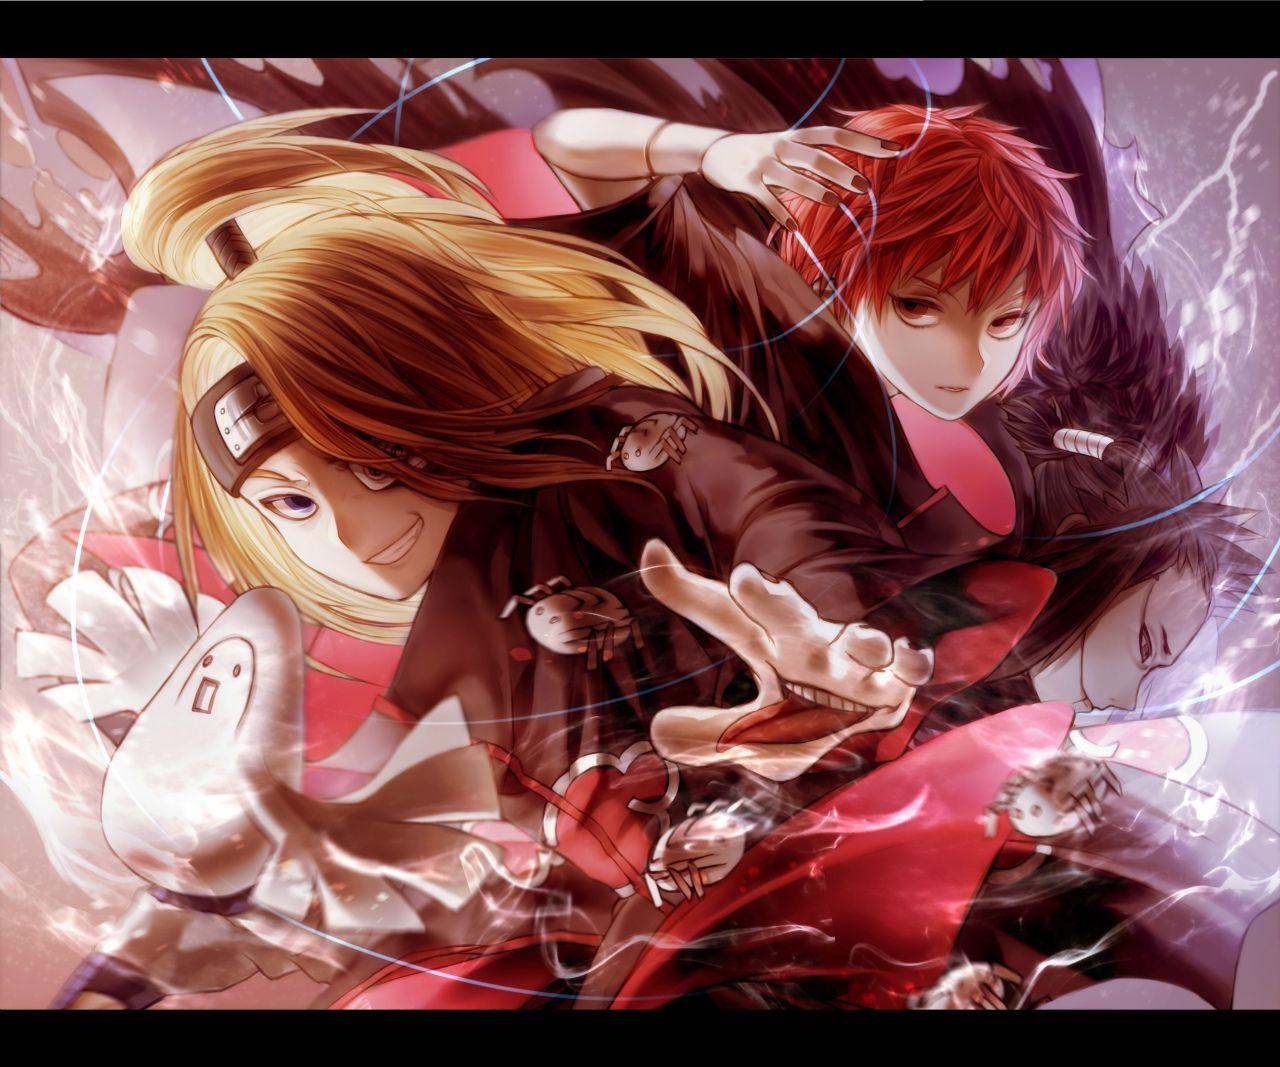 Dei Y Sasori 7u7 C Ven Divinos 3 Sasori And Deidara Anime Naruto Anime